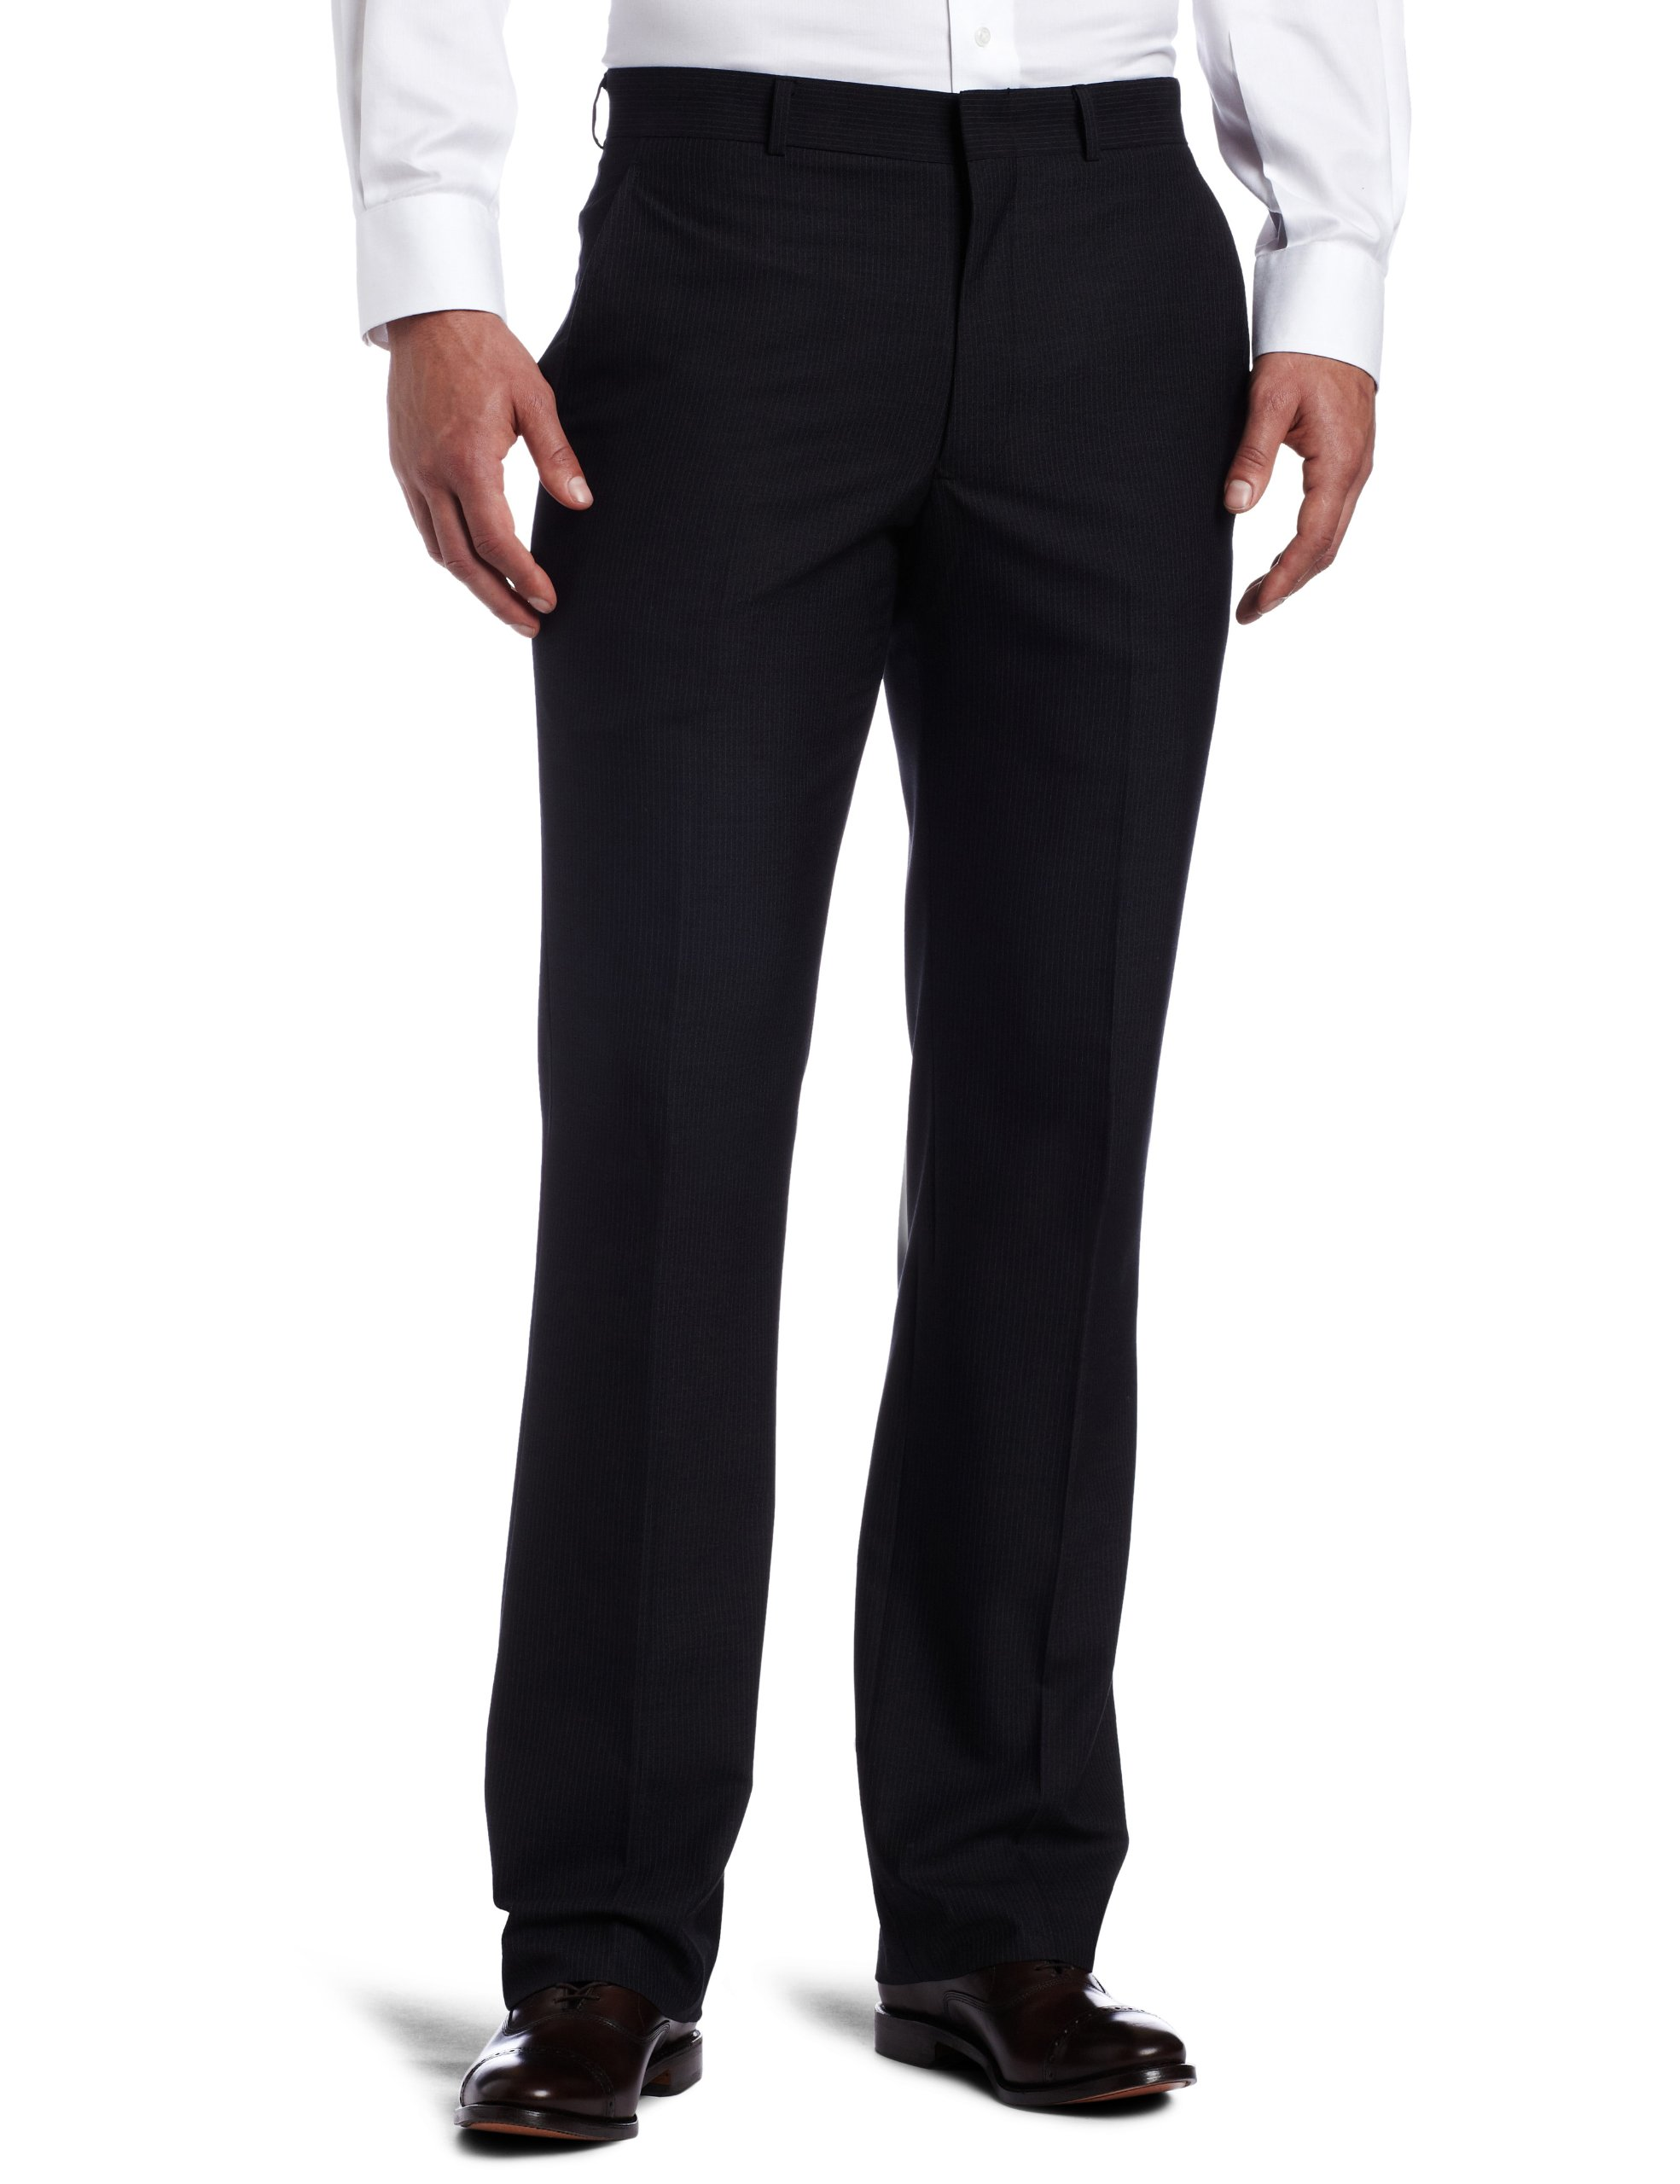 Kenneth Cole REACTION Men's Grey Stripe Suit Separate Pant, Grey Stripe, 40x32